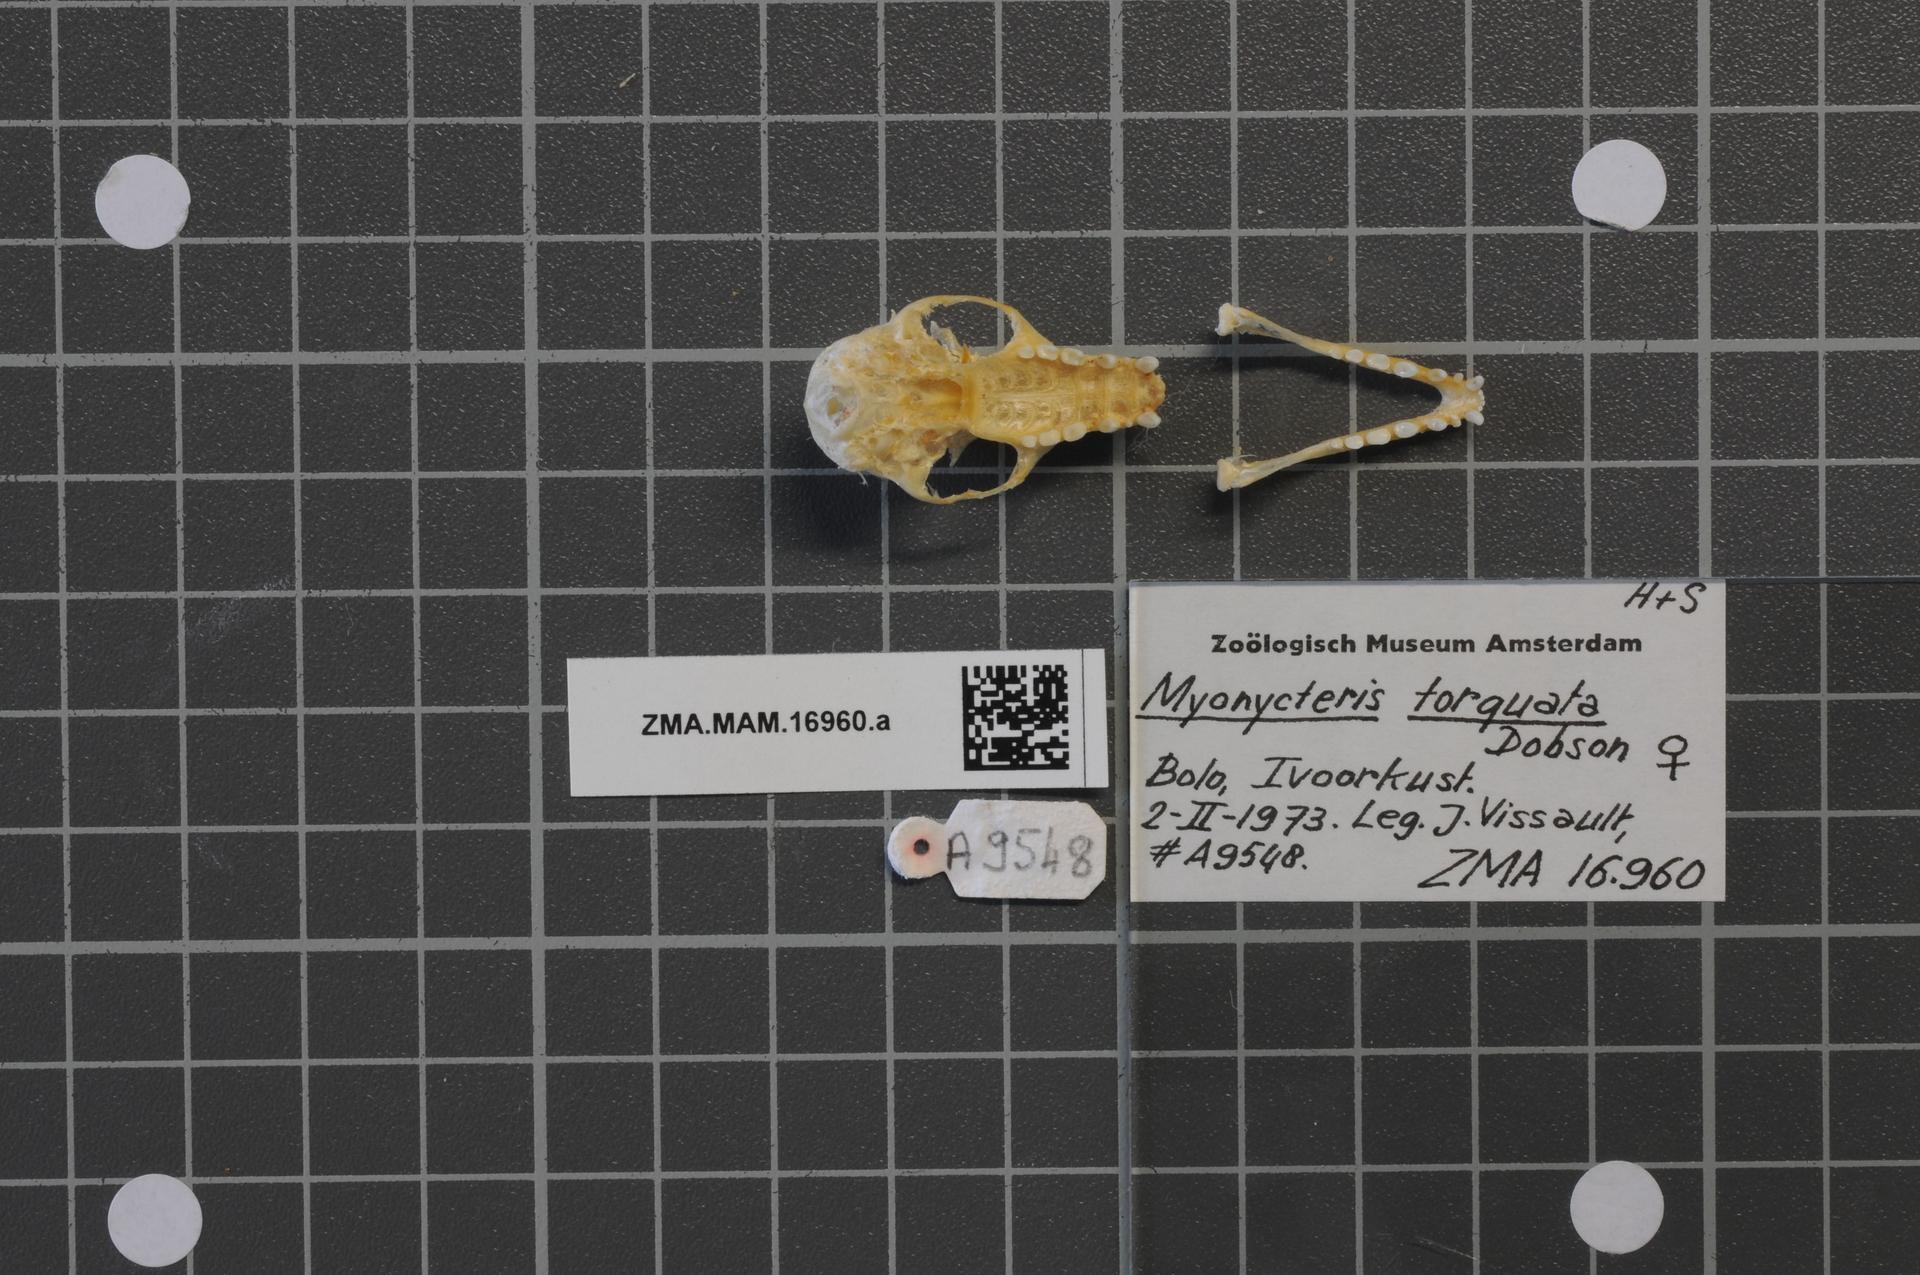 File:Naturalis Biodiversity Center - ZMA.MAM.16960.a pal - Myonycteris